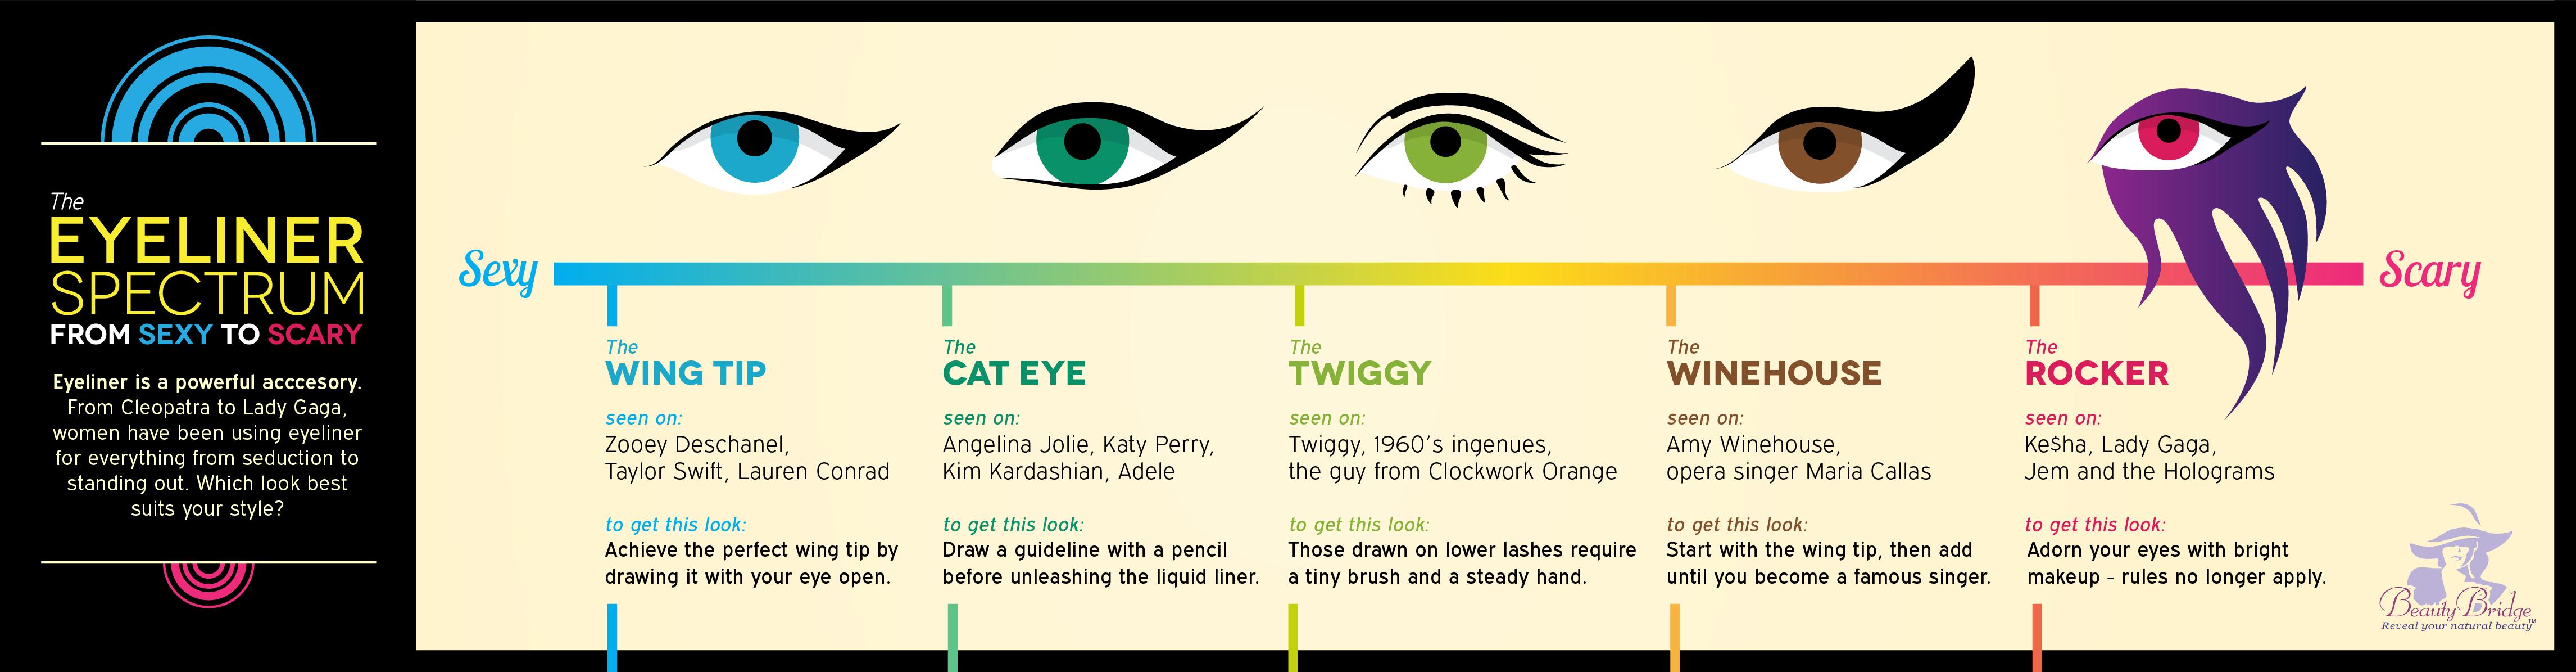 Eyeliner Spectrum